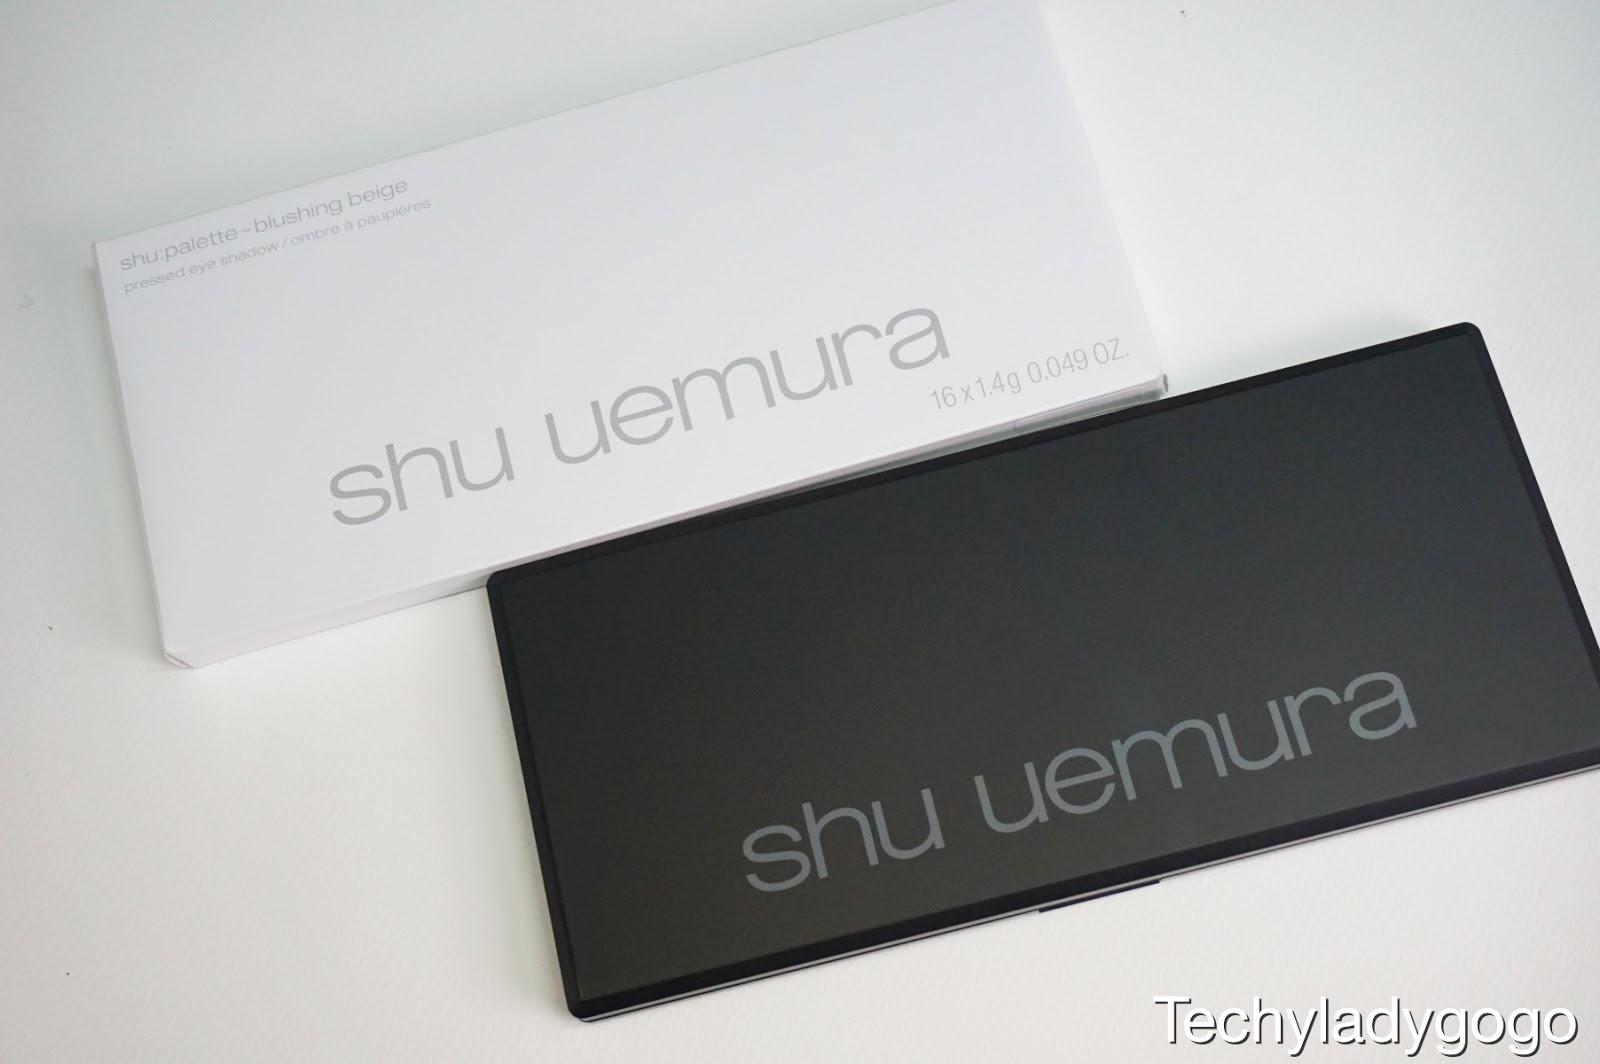 SHU UEMURA Blushing Beige Eyeshadow Palette